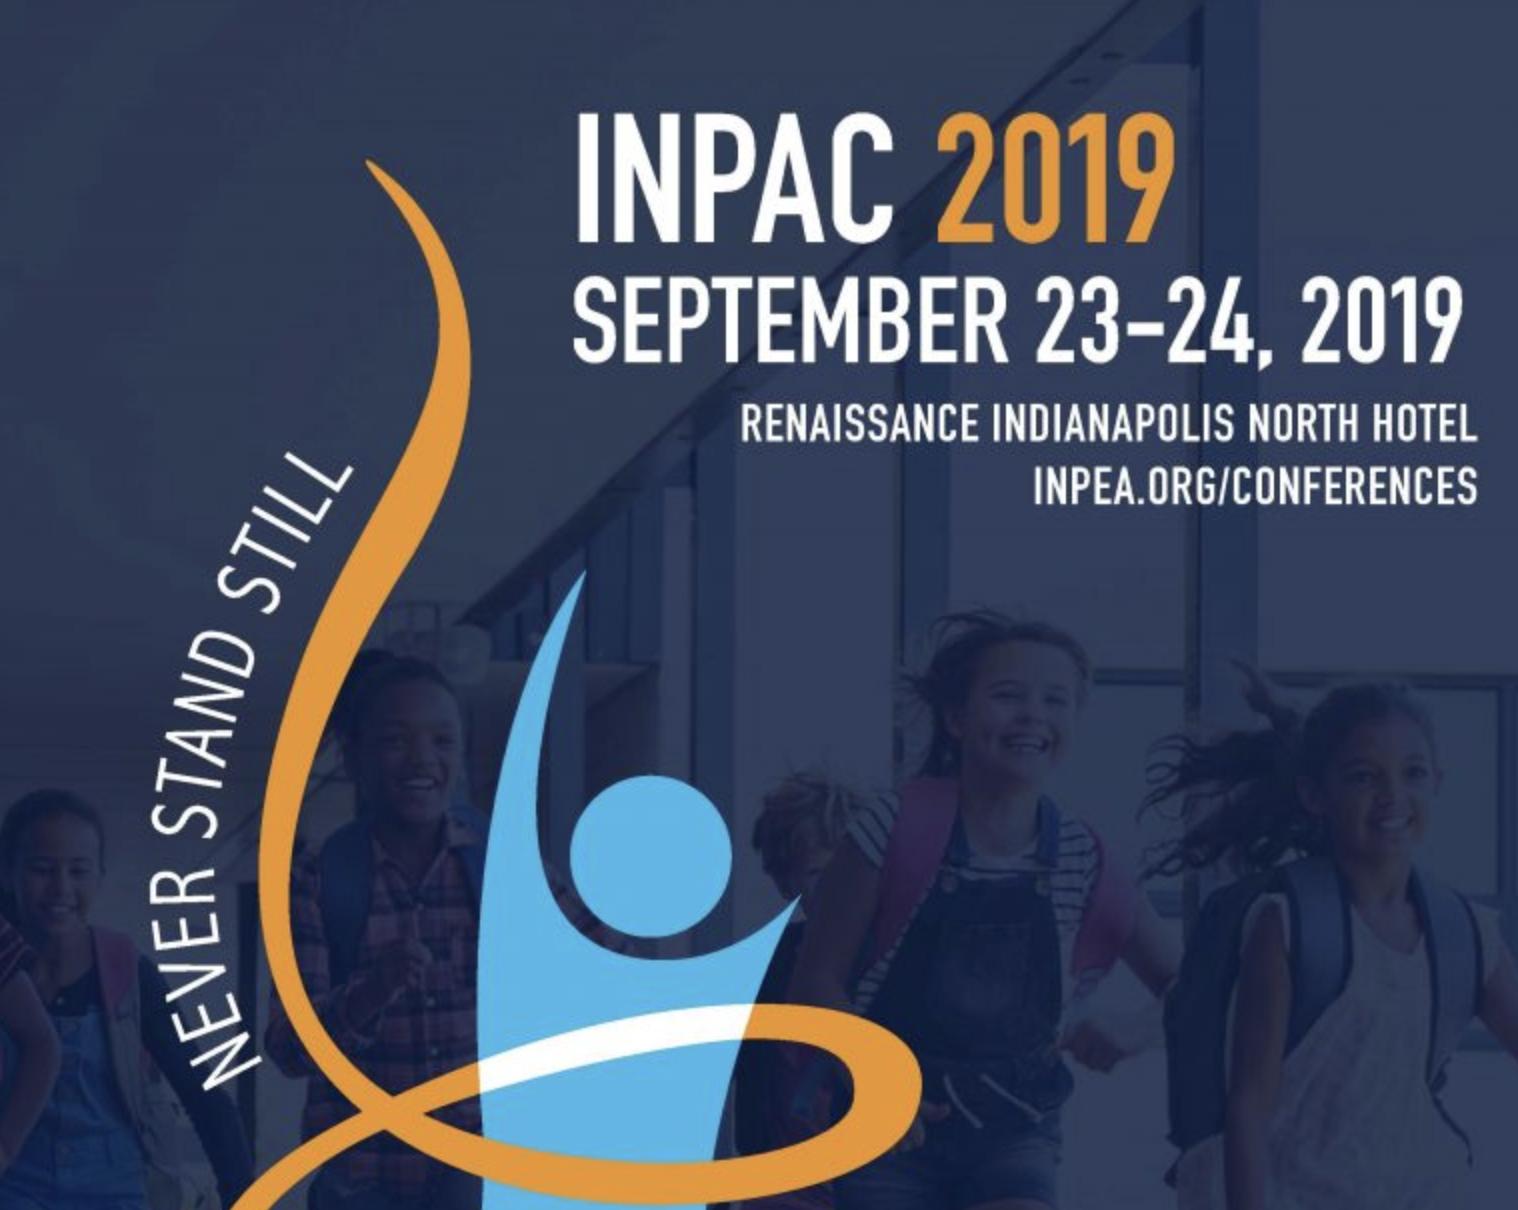 INPAC 2019 Conference Logo